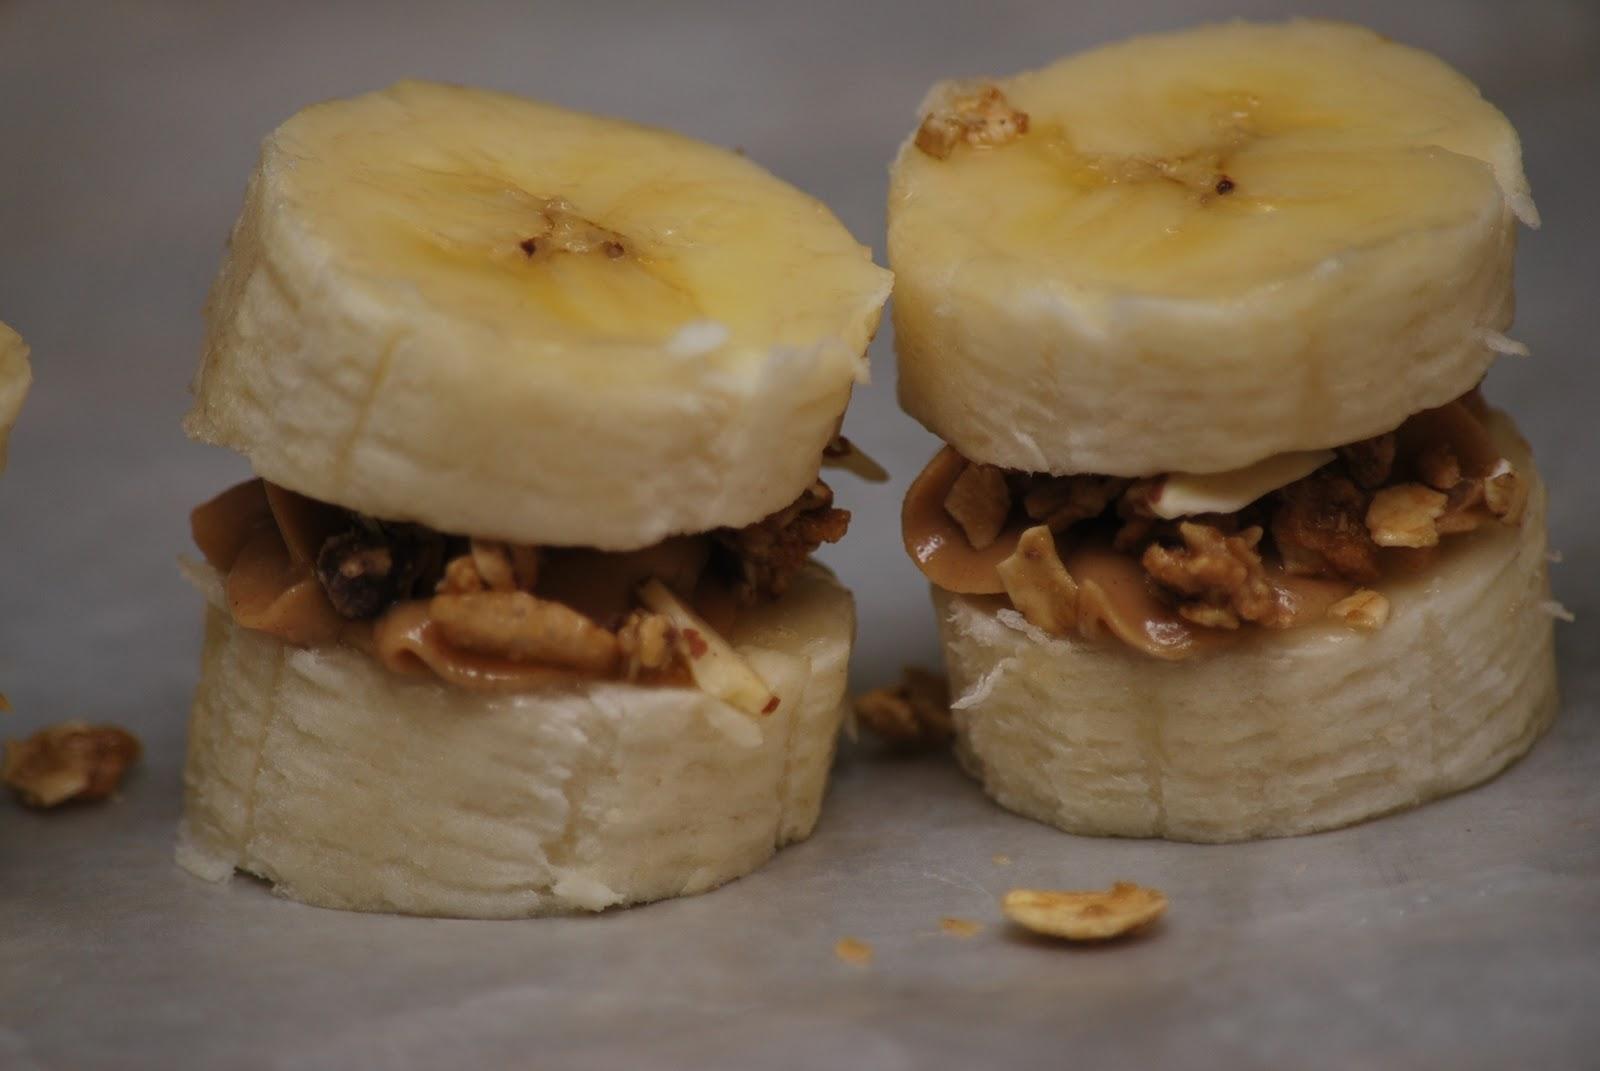 My story in recipes: Banana Peanut Butter Bites